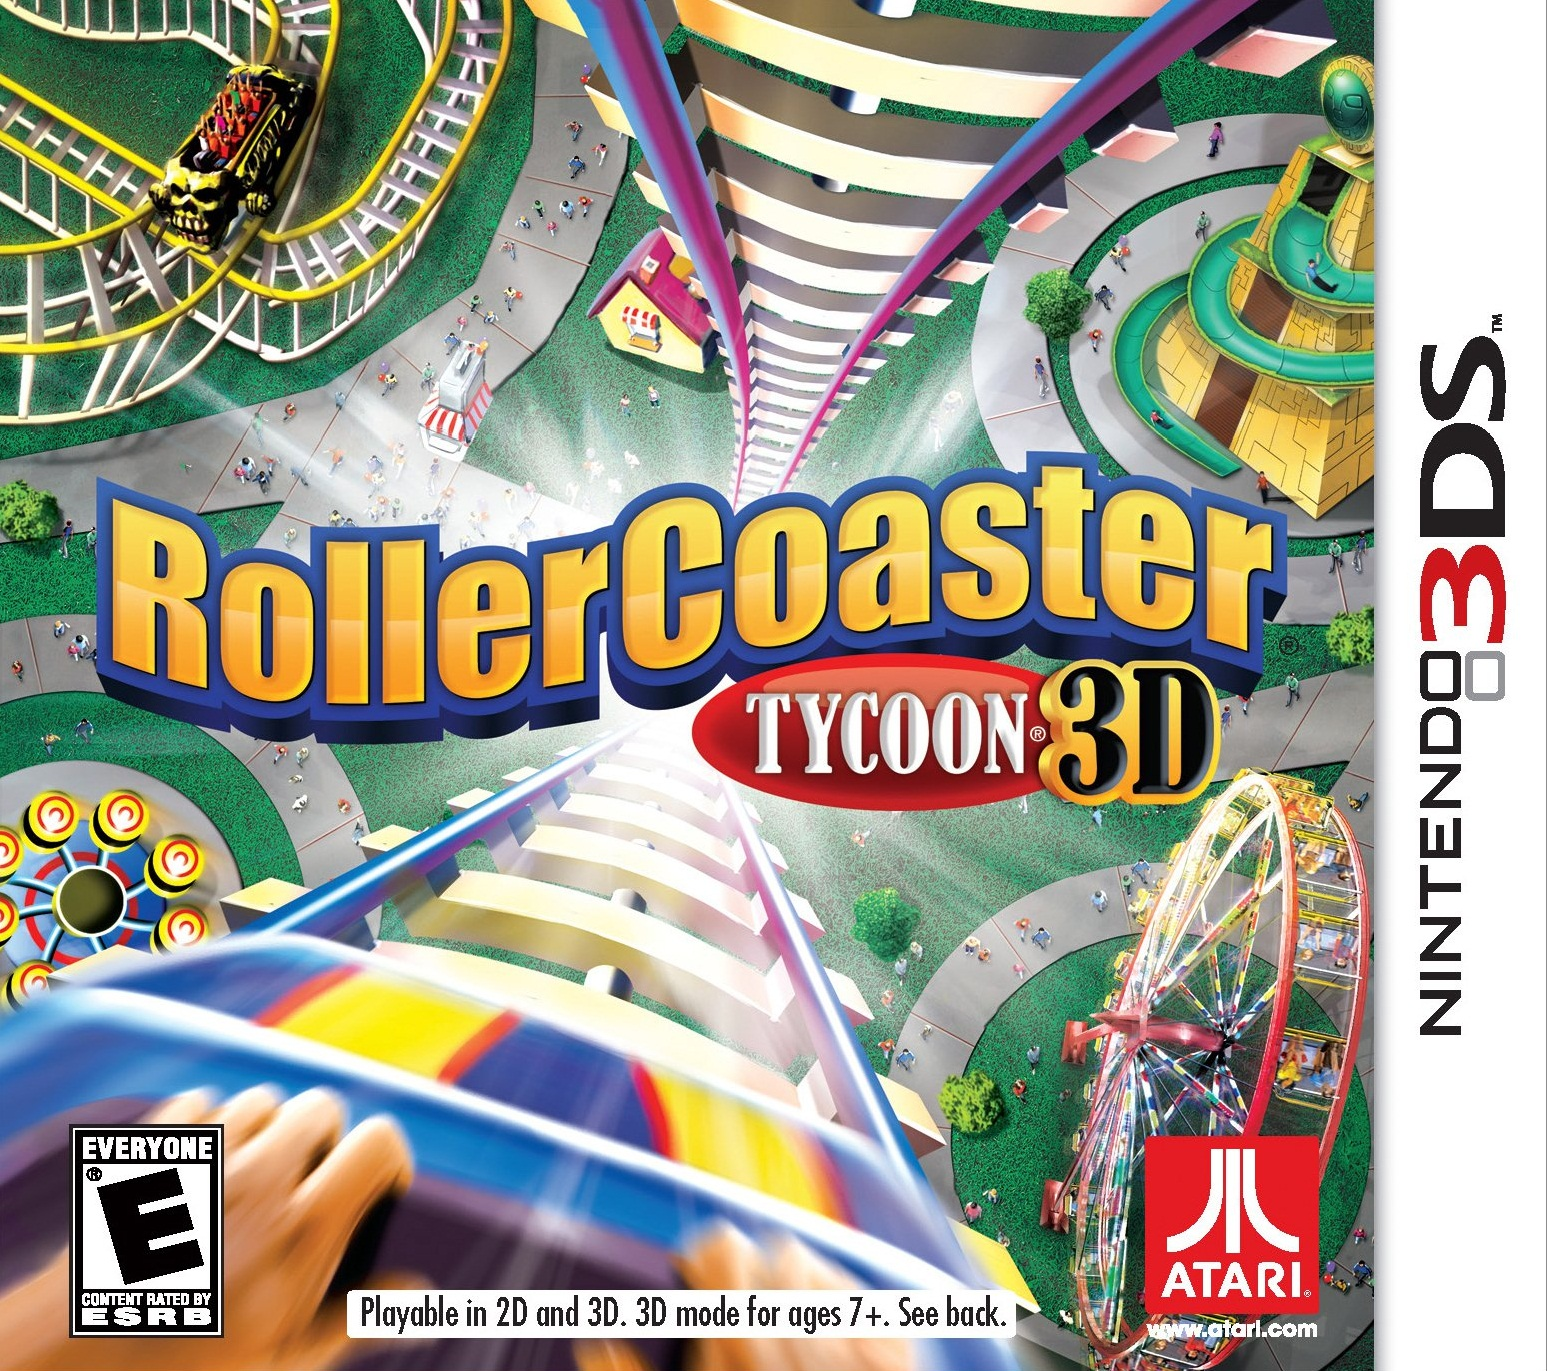 RollerCoaster Tycoon 3D | RollerCoaster Tycoon | FANDOM